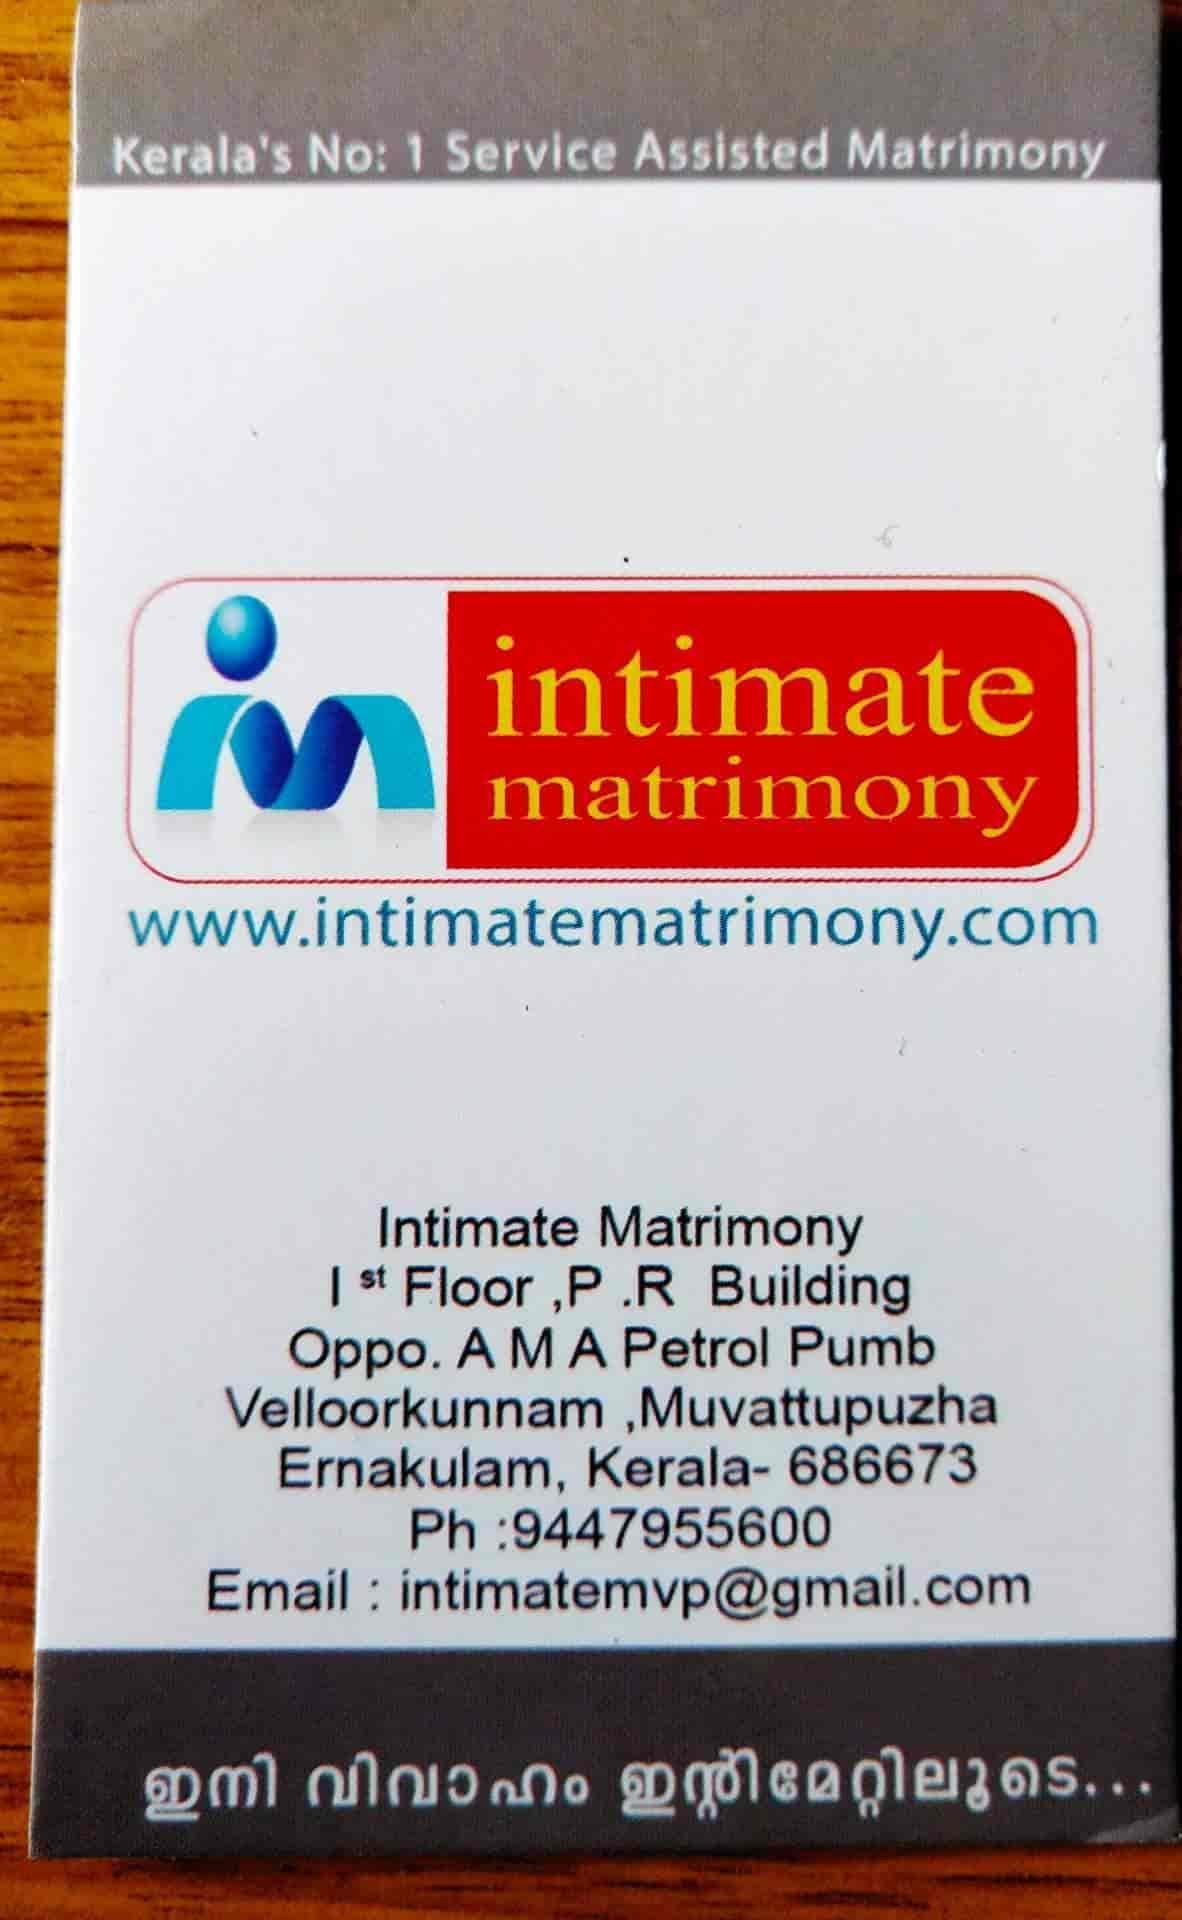 Intimate Matrimony, Muvattupuzha - Matrimonial Bureaus in